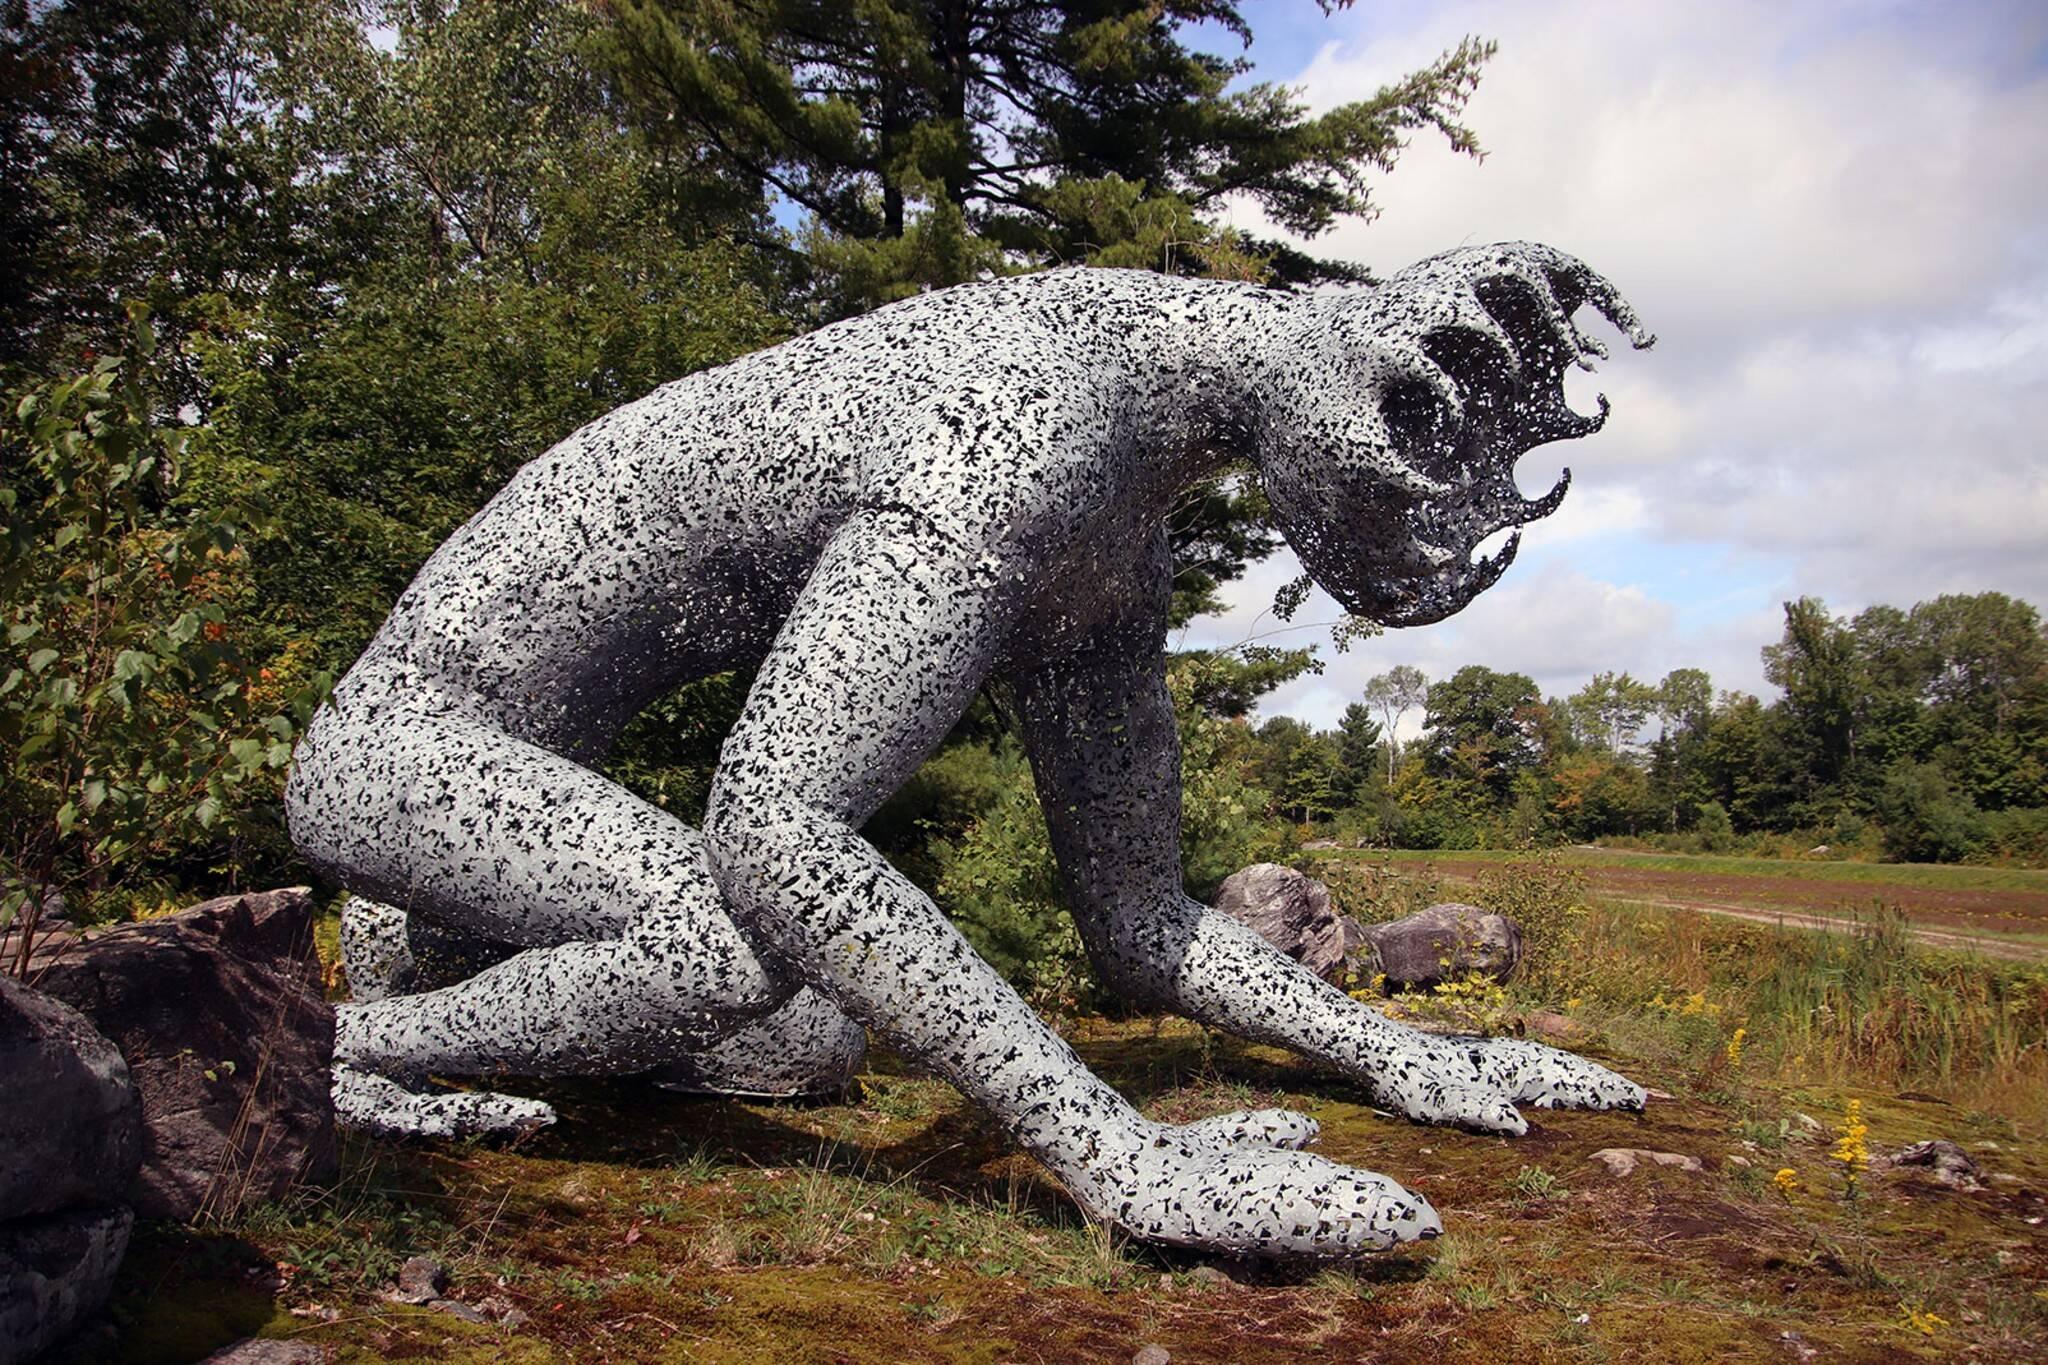 Bala Bog Monster Muskoka